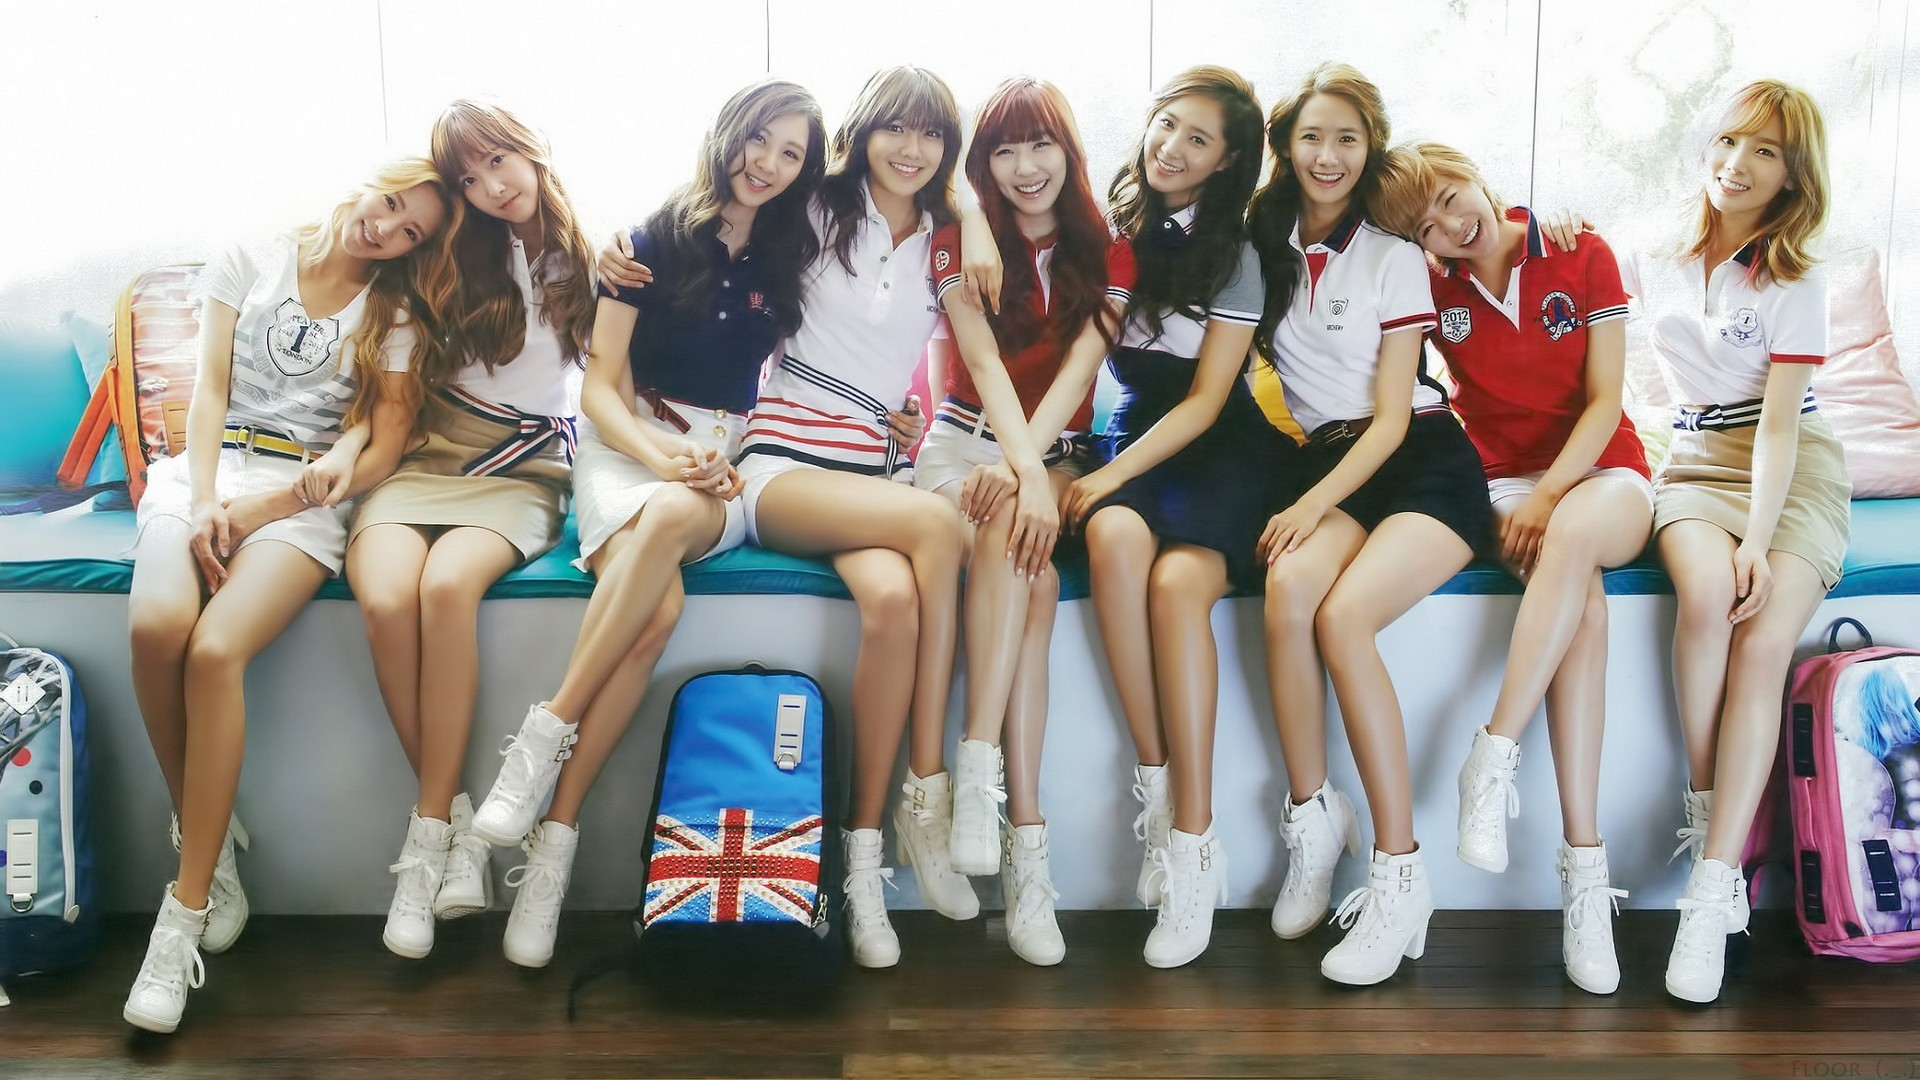 People 1920x1080 SNSD Girls' Generation Kim Taeyeon Lee Soonkyu Sunny Yoona Im Yoona Kim Hyoyeon Seohyun Tiffany Hwang Kwon Yuri Jessica Jung Choi Sooyoung women group of women Asian sitting blonde brunette redhead smiling looking at viewer